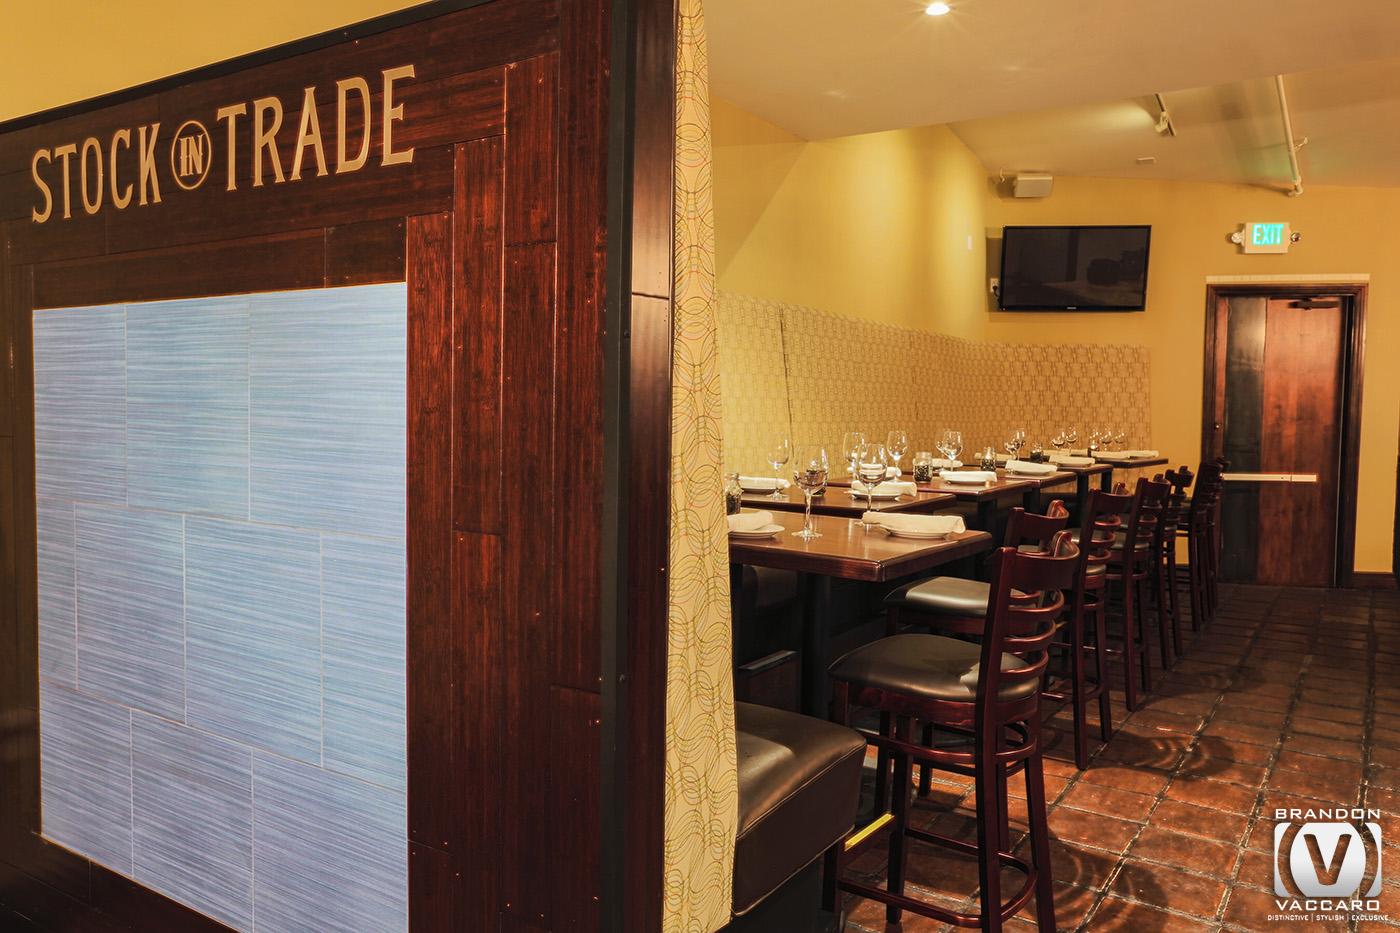 architexture-stock-in-trade-restaurant-Bar.jpg